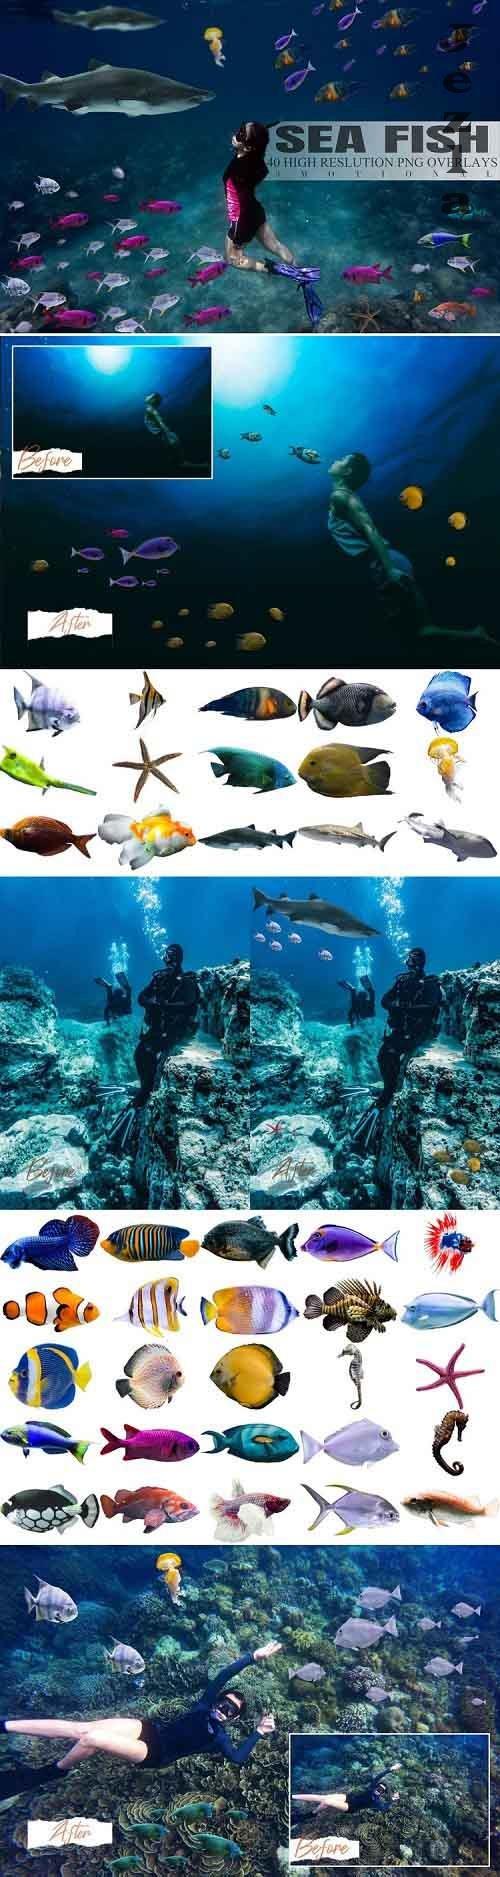 40 Sea Fish Overlays - 819509